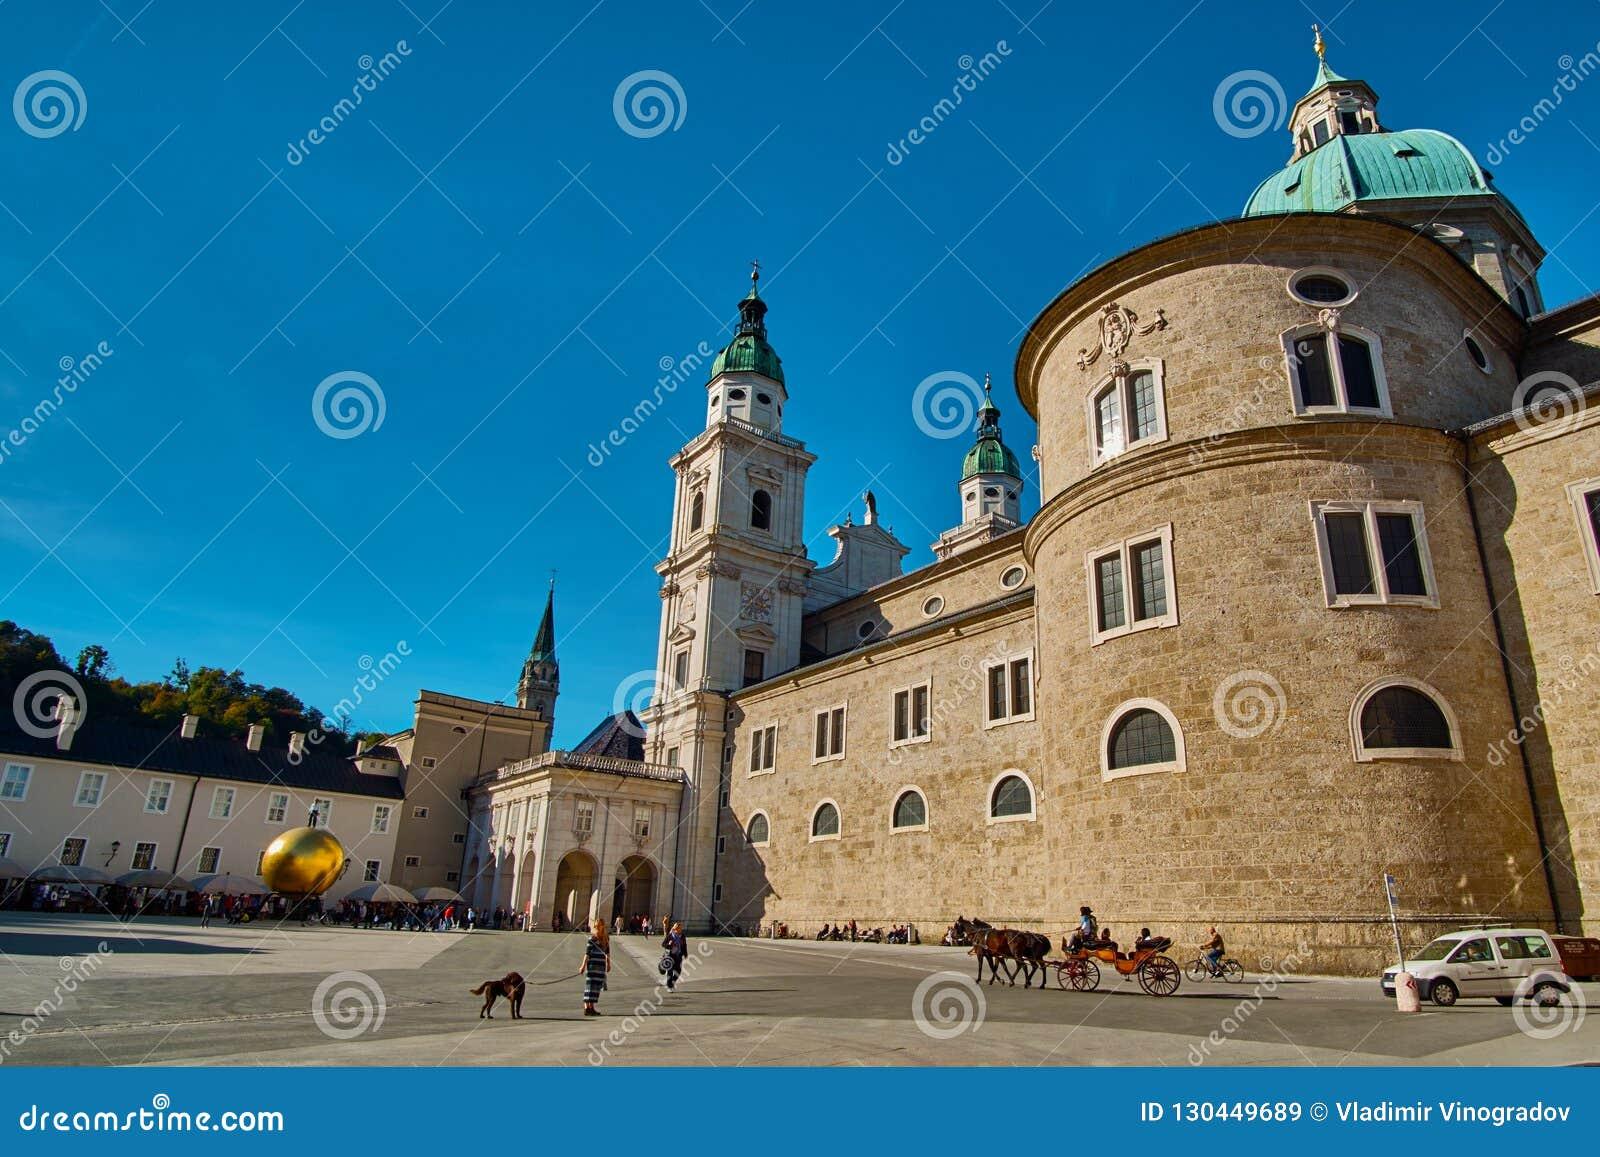 Salzburg, Salzburger Land, Austria - September 11, 2018: Beautiful sunny view of Salzburg Cathedral Dom zu Salzburg